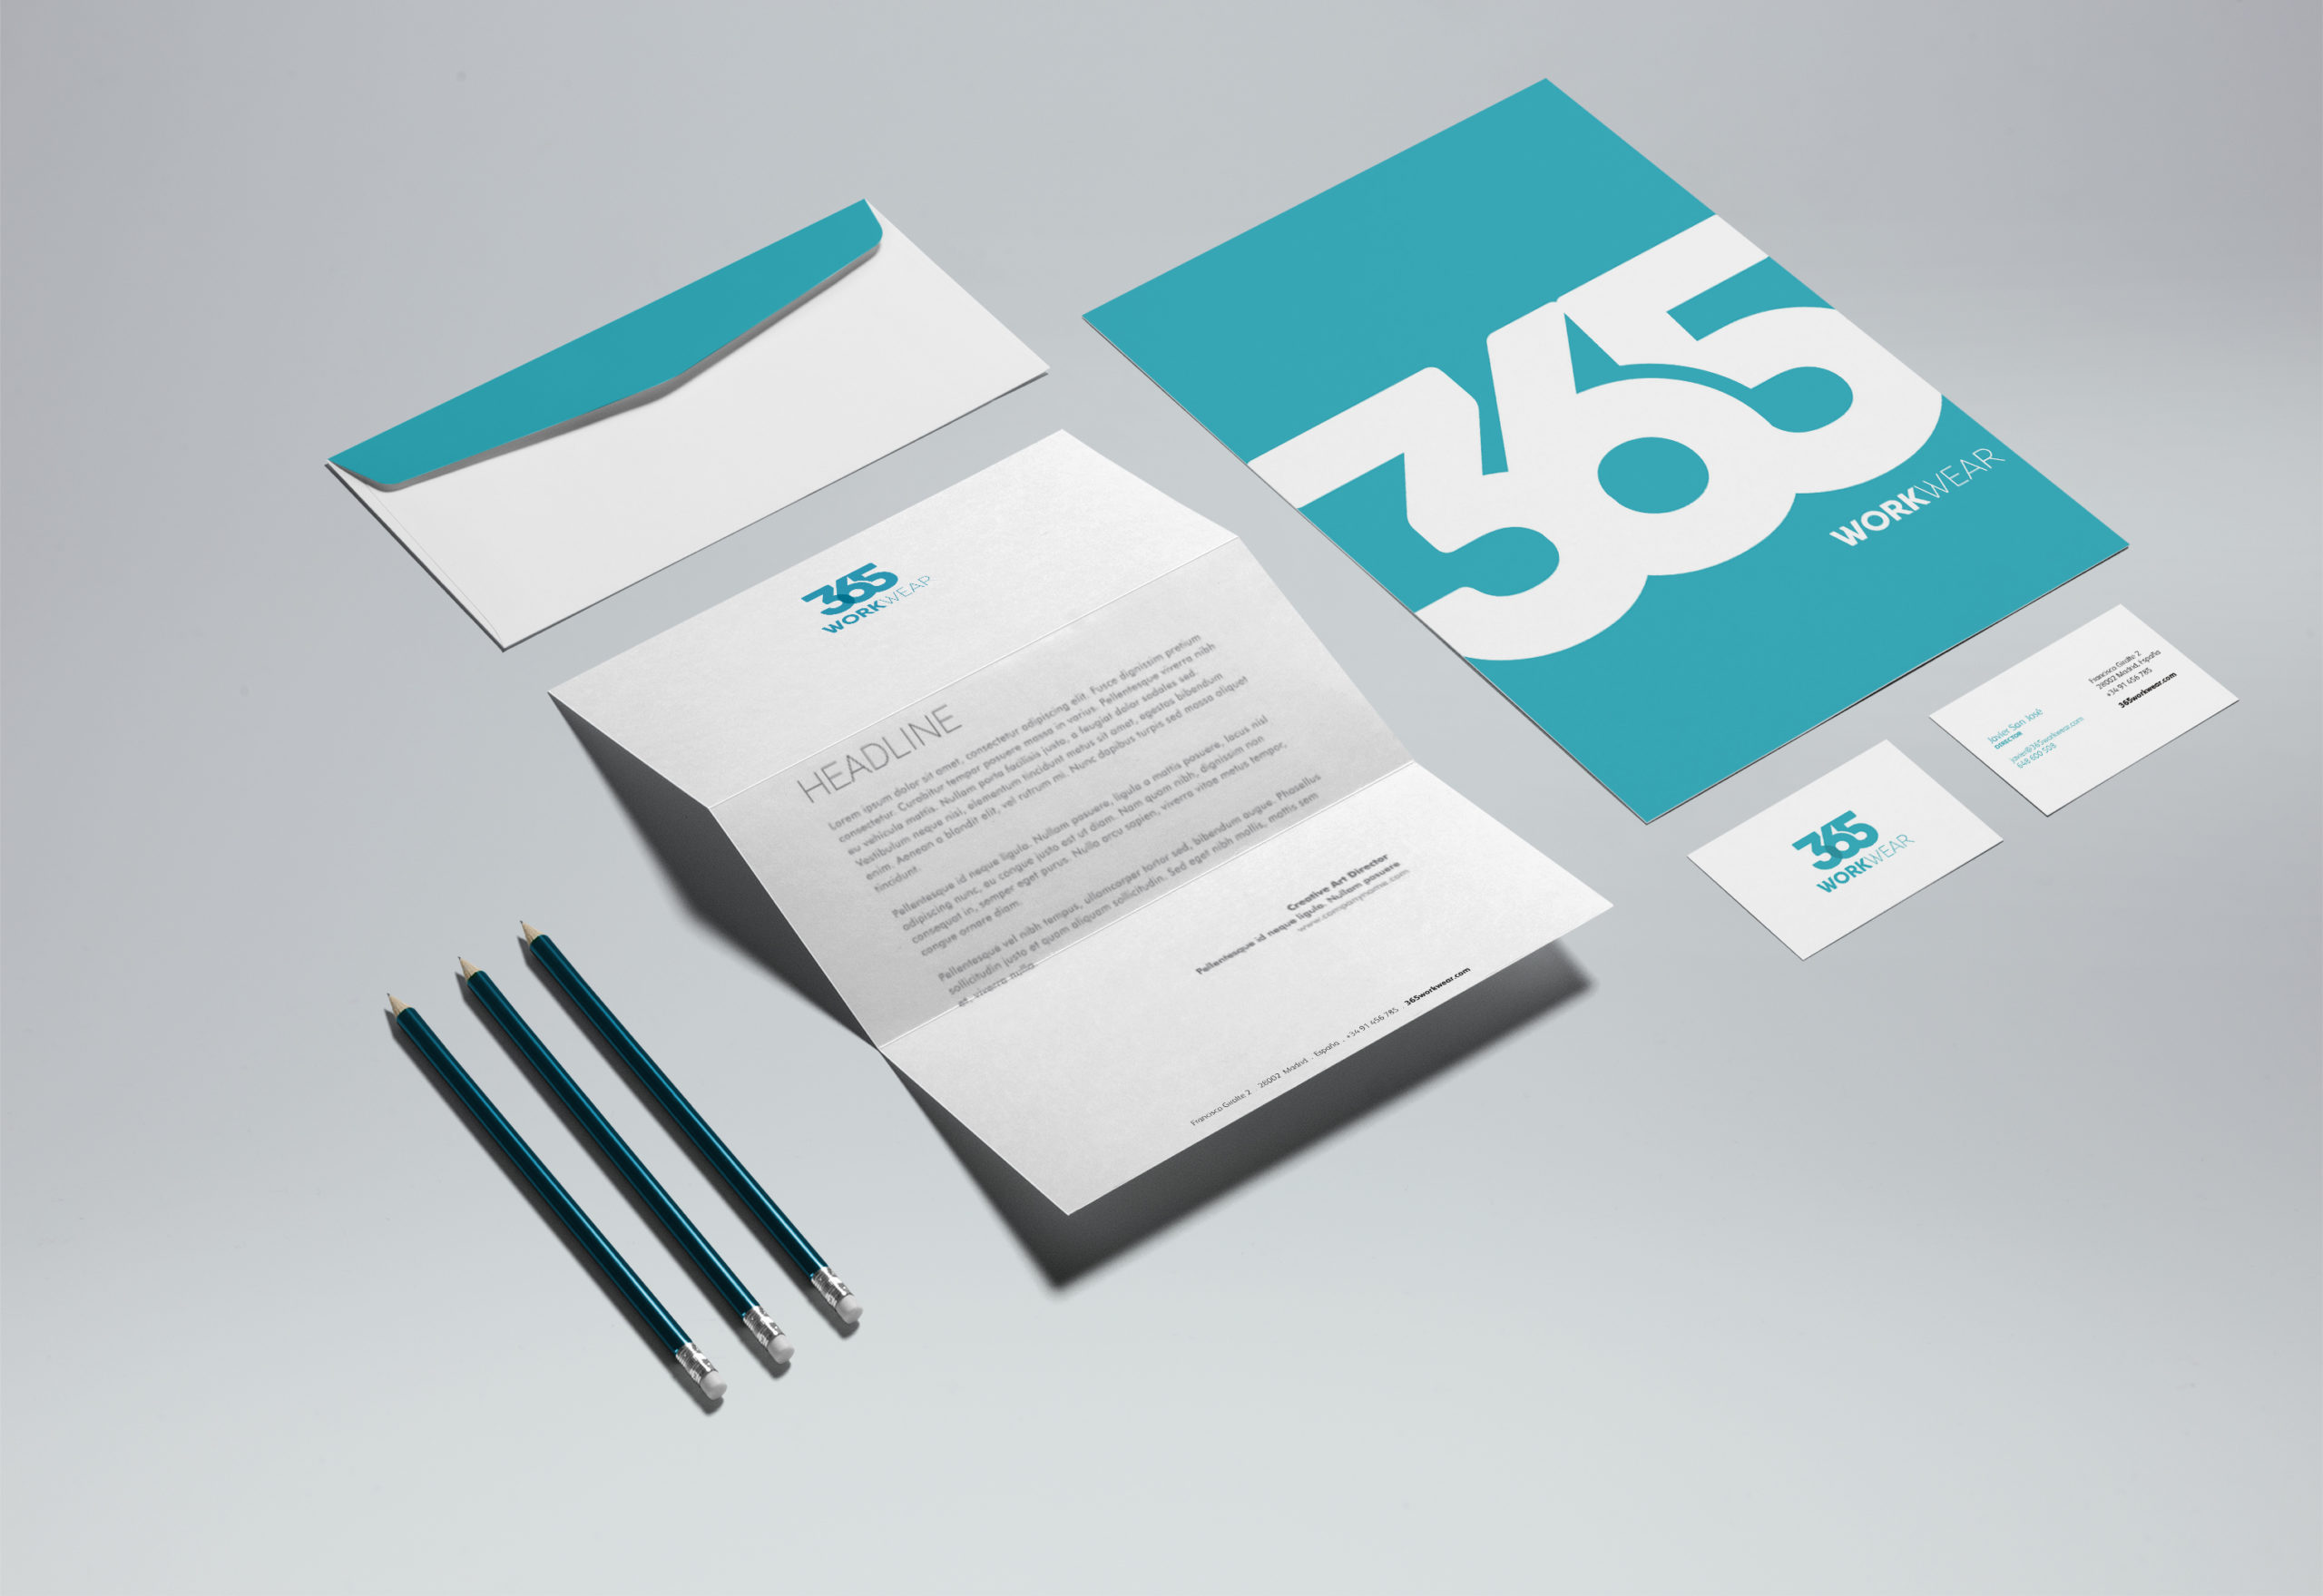 365 workwear papeleria